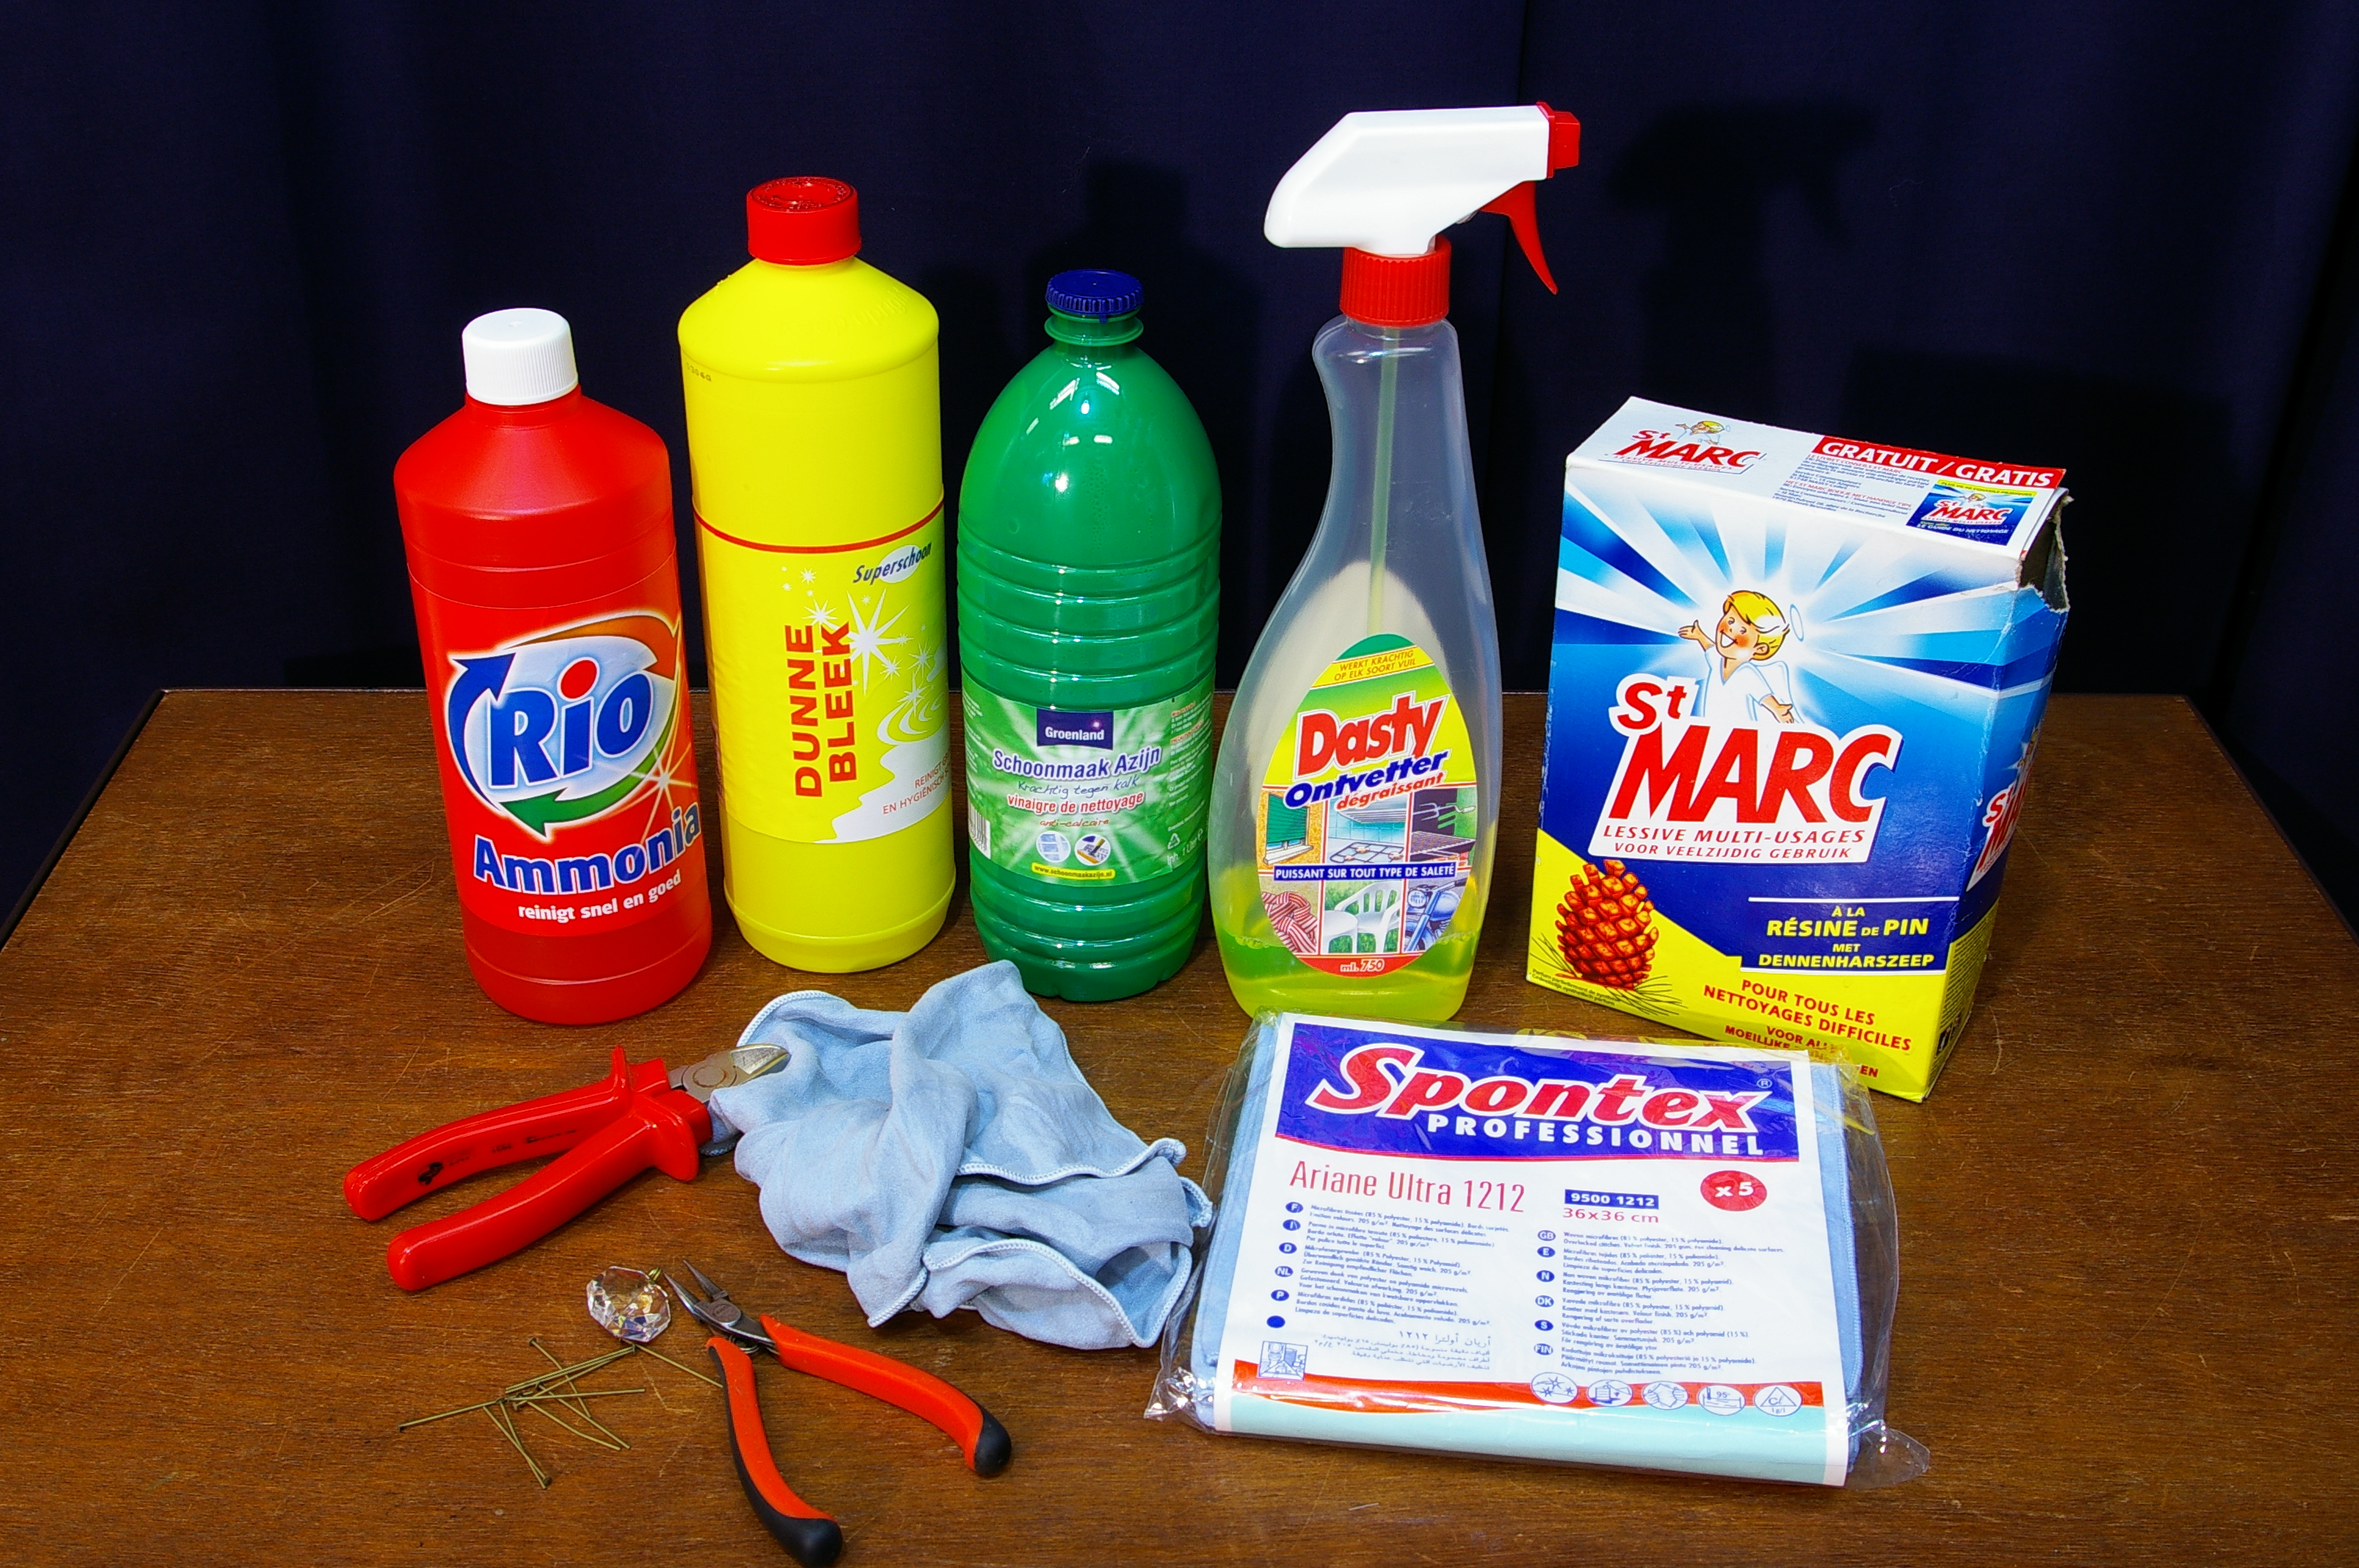 Schoonmaken kroonluchter / cleaning chandelier / reinigung Kronleuchter